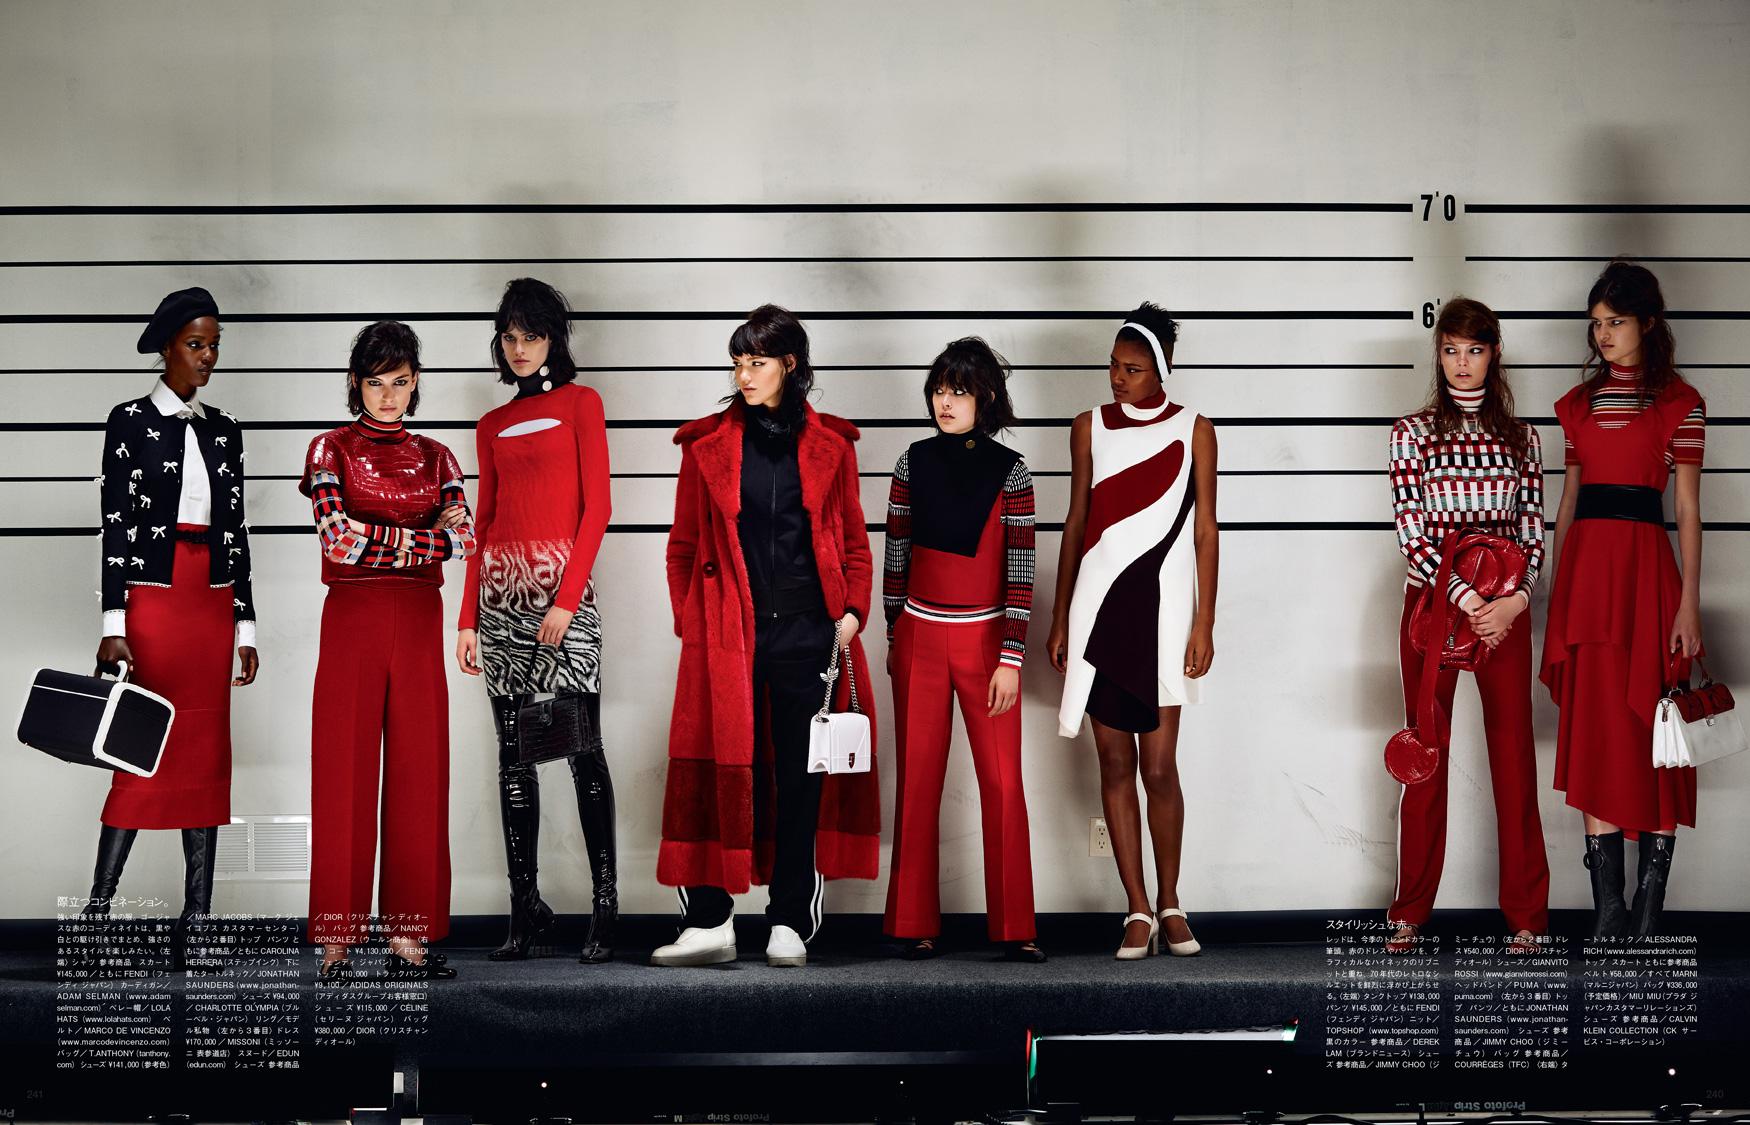 Giovanna-Battaglia-Vogue-Japan-November-2015-Fashion-Line-Up-2.jpg